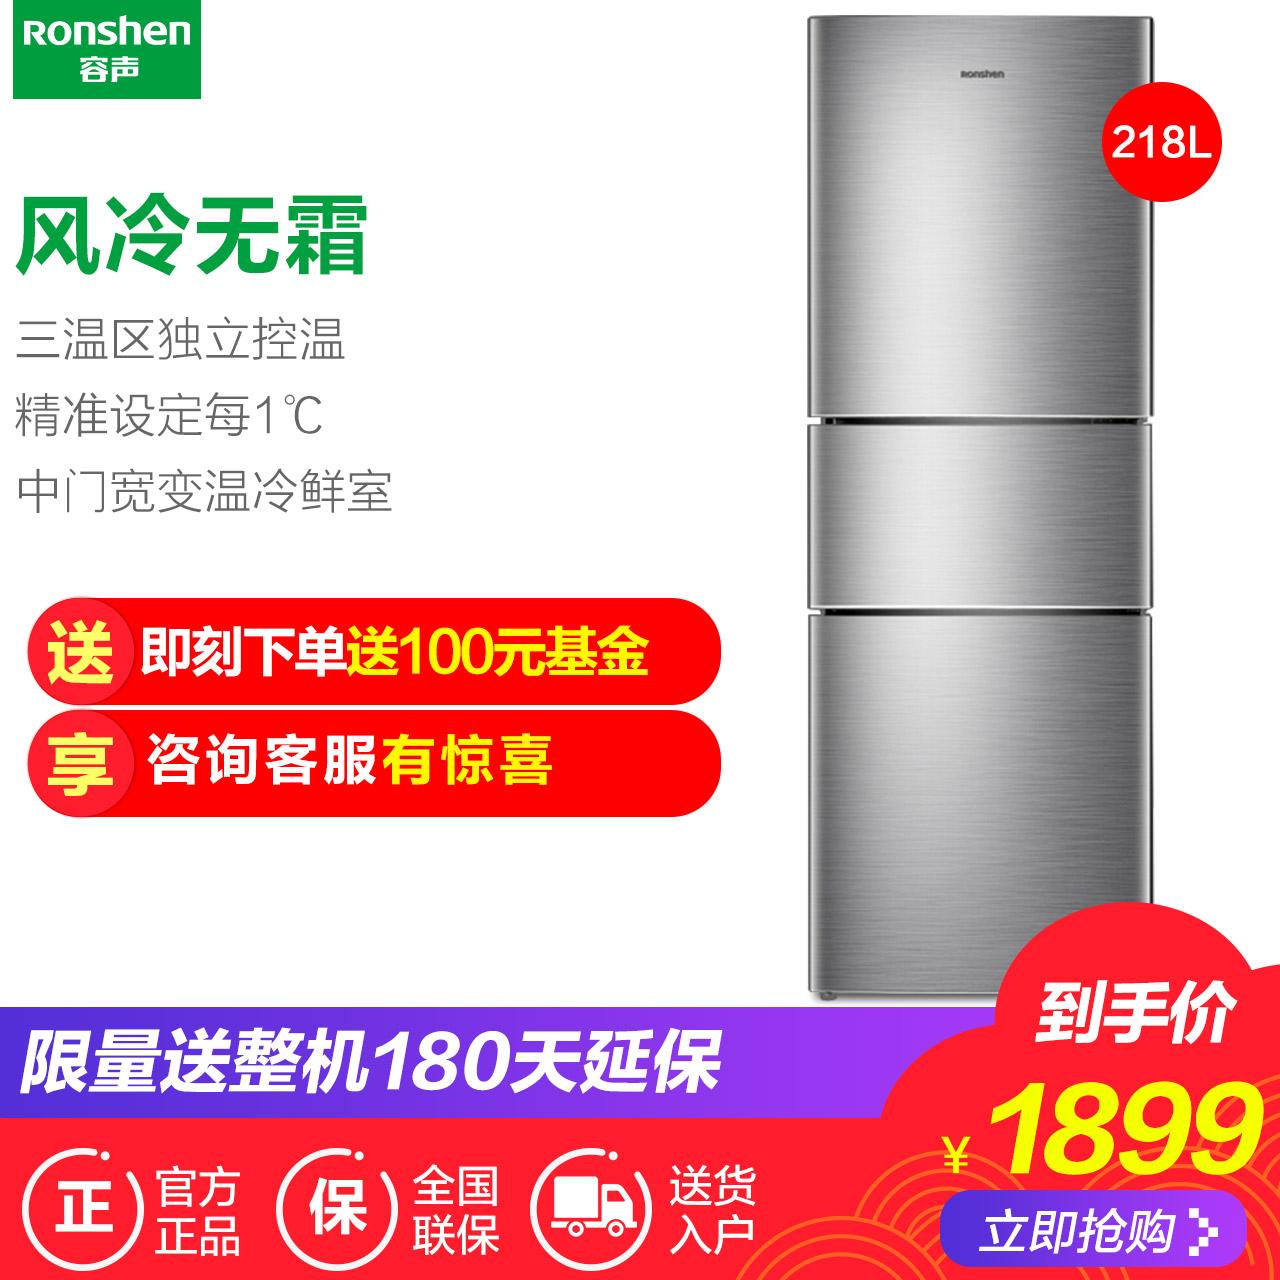 Ronshen-容声 BCD-218WD11NY电冰箱三门式三开门家用冷冻冷藏节能